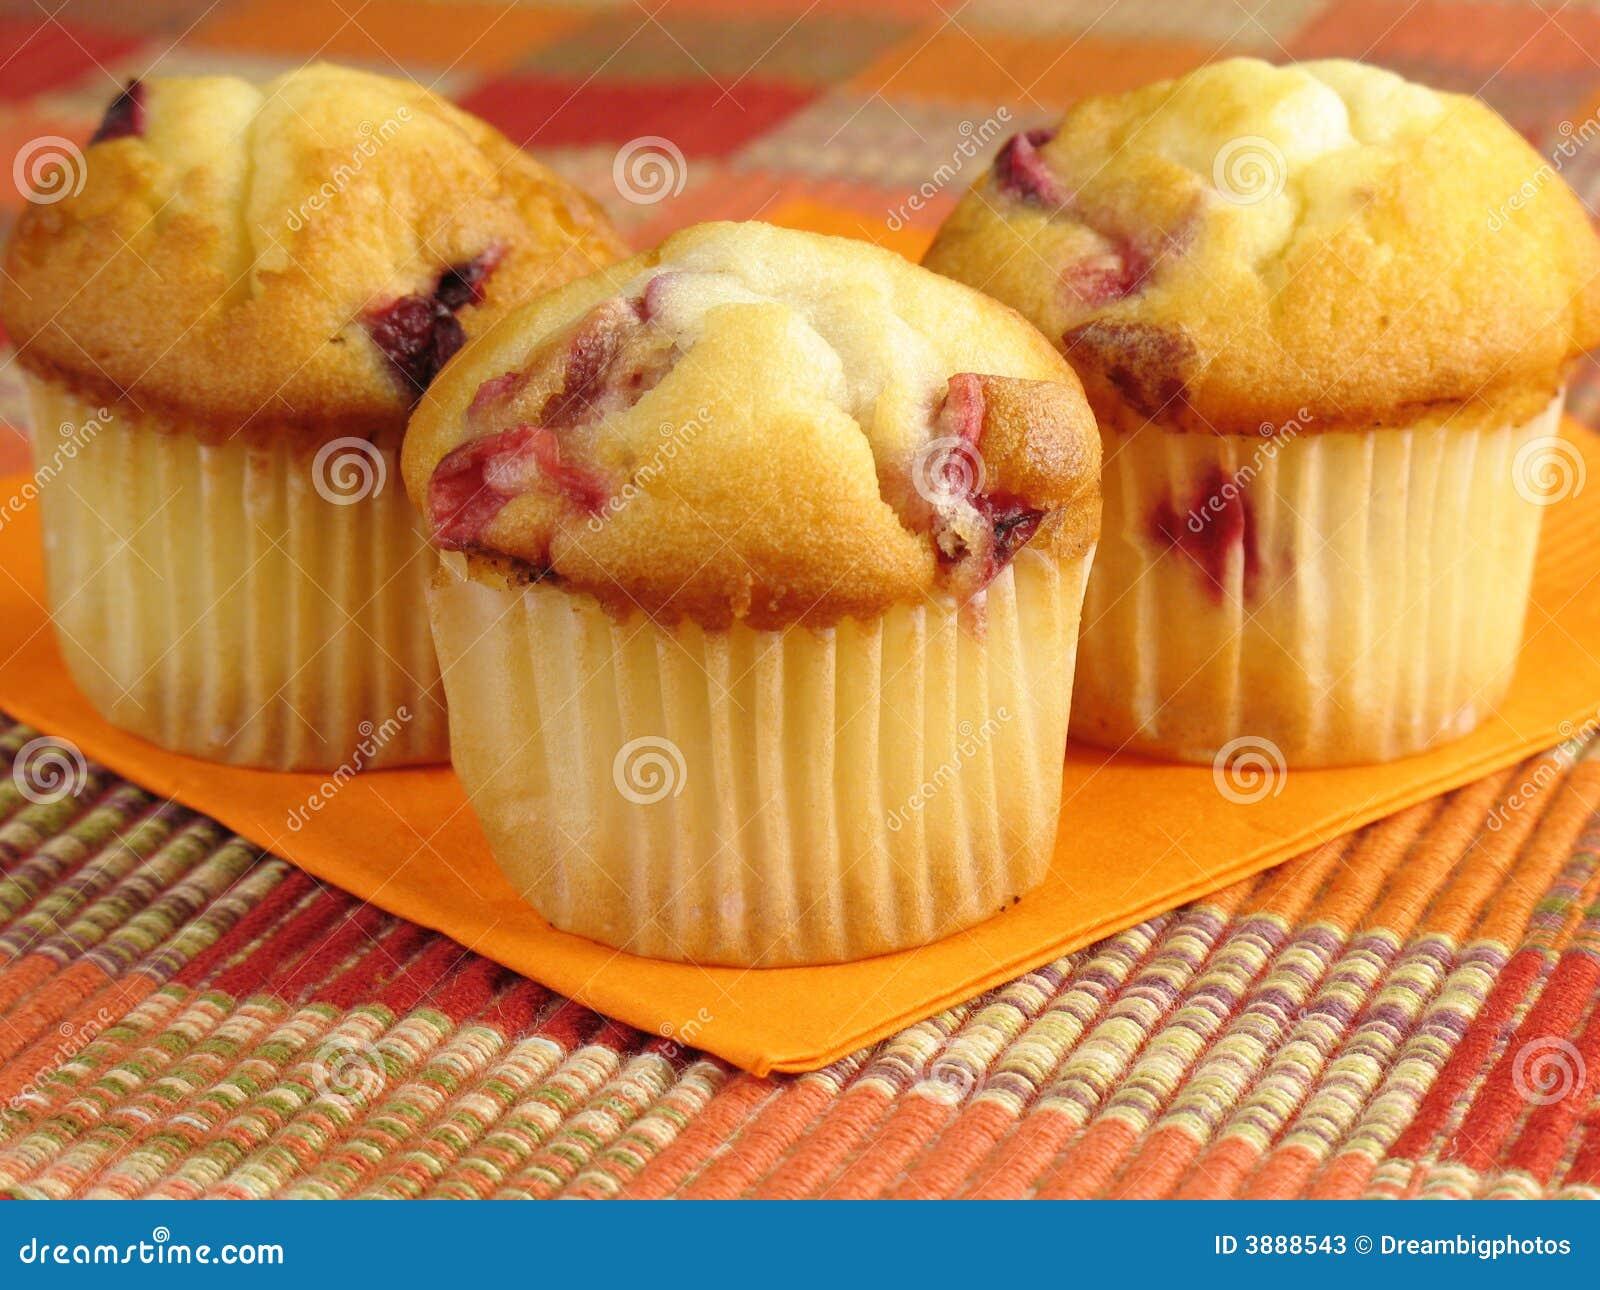 Tempting Cranberry Orange Muffins